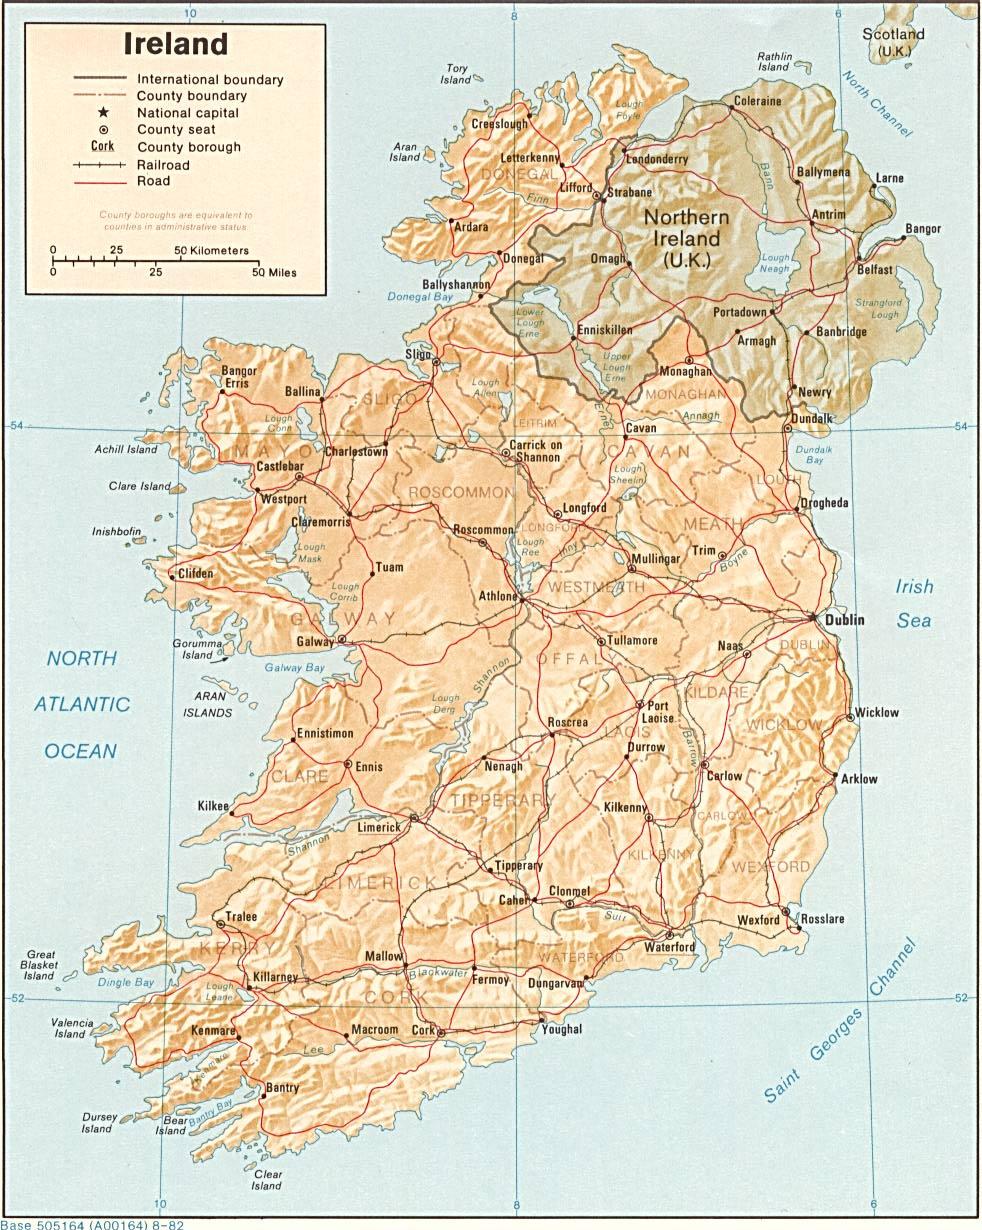 Irelands History In Maps Irish History Geography And Genealogy - Ireland major cities map